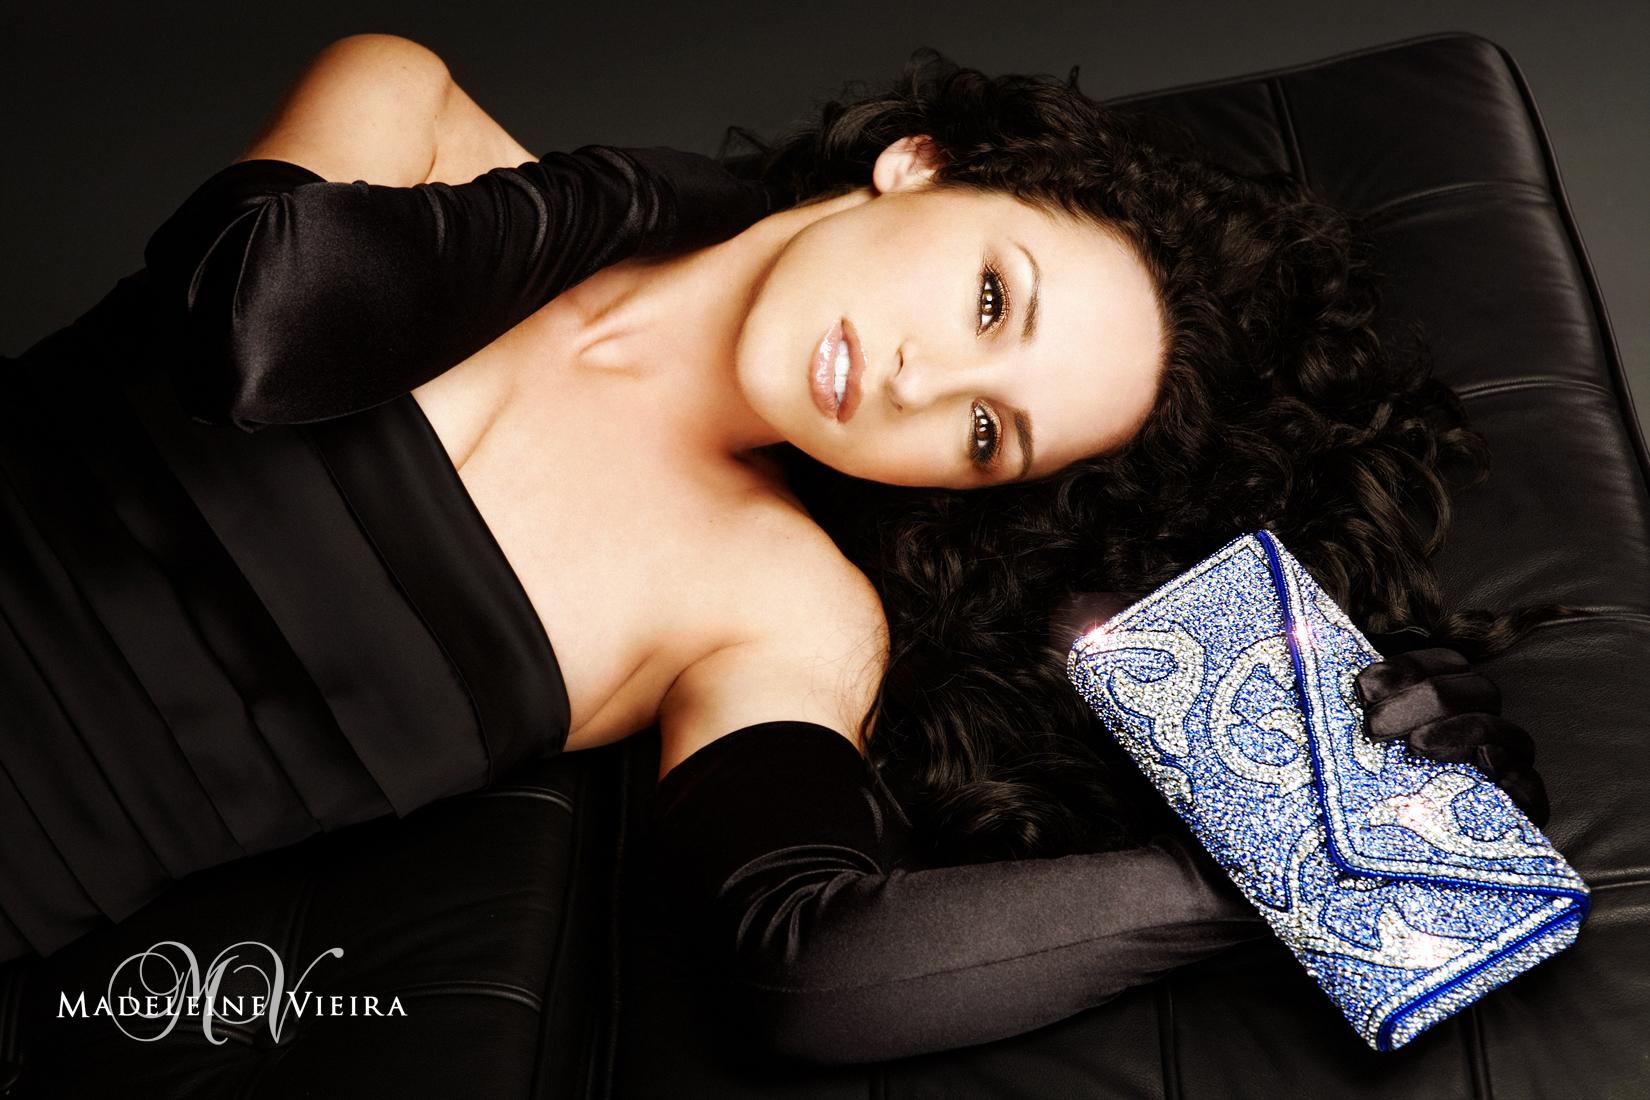 Madeleine_Vieira_0108.jpg